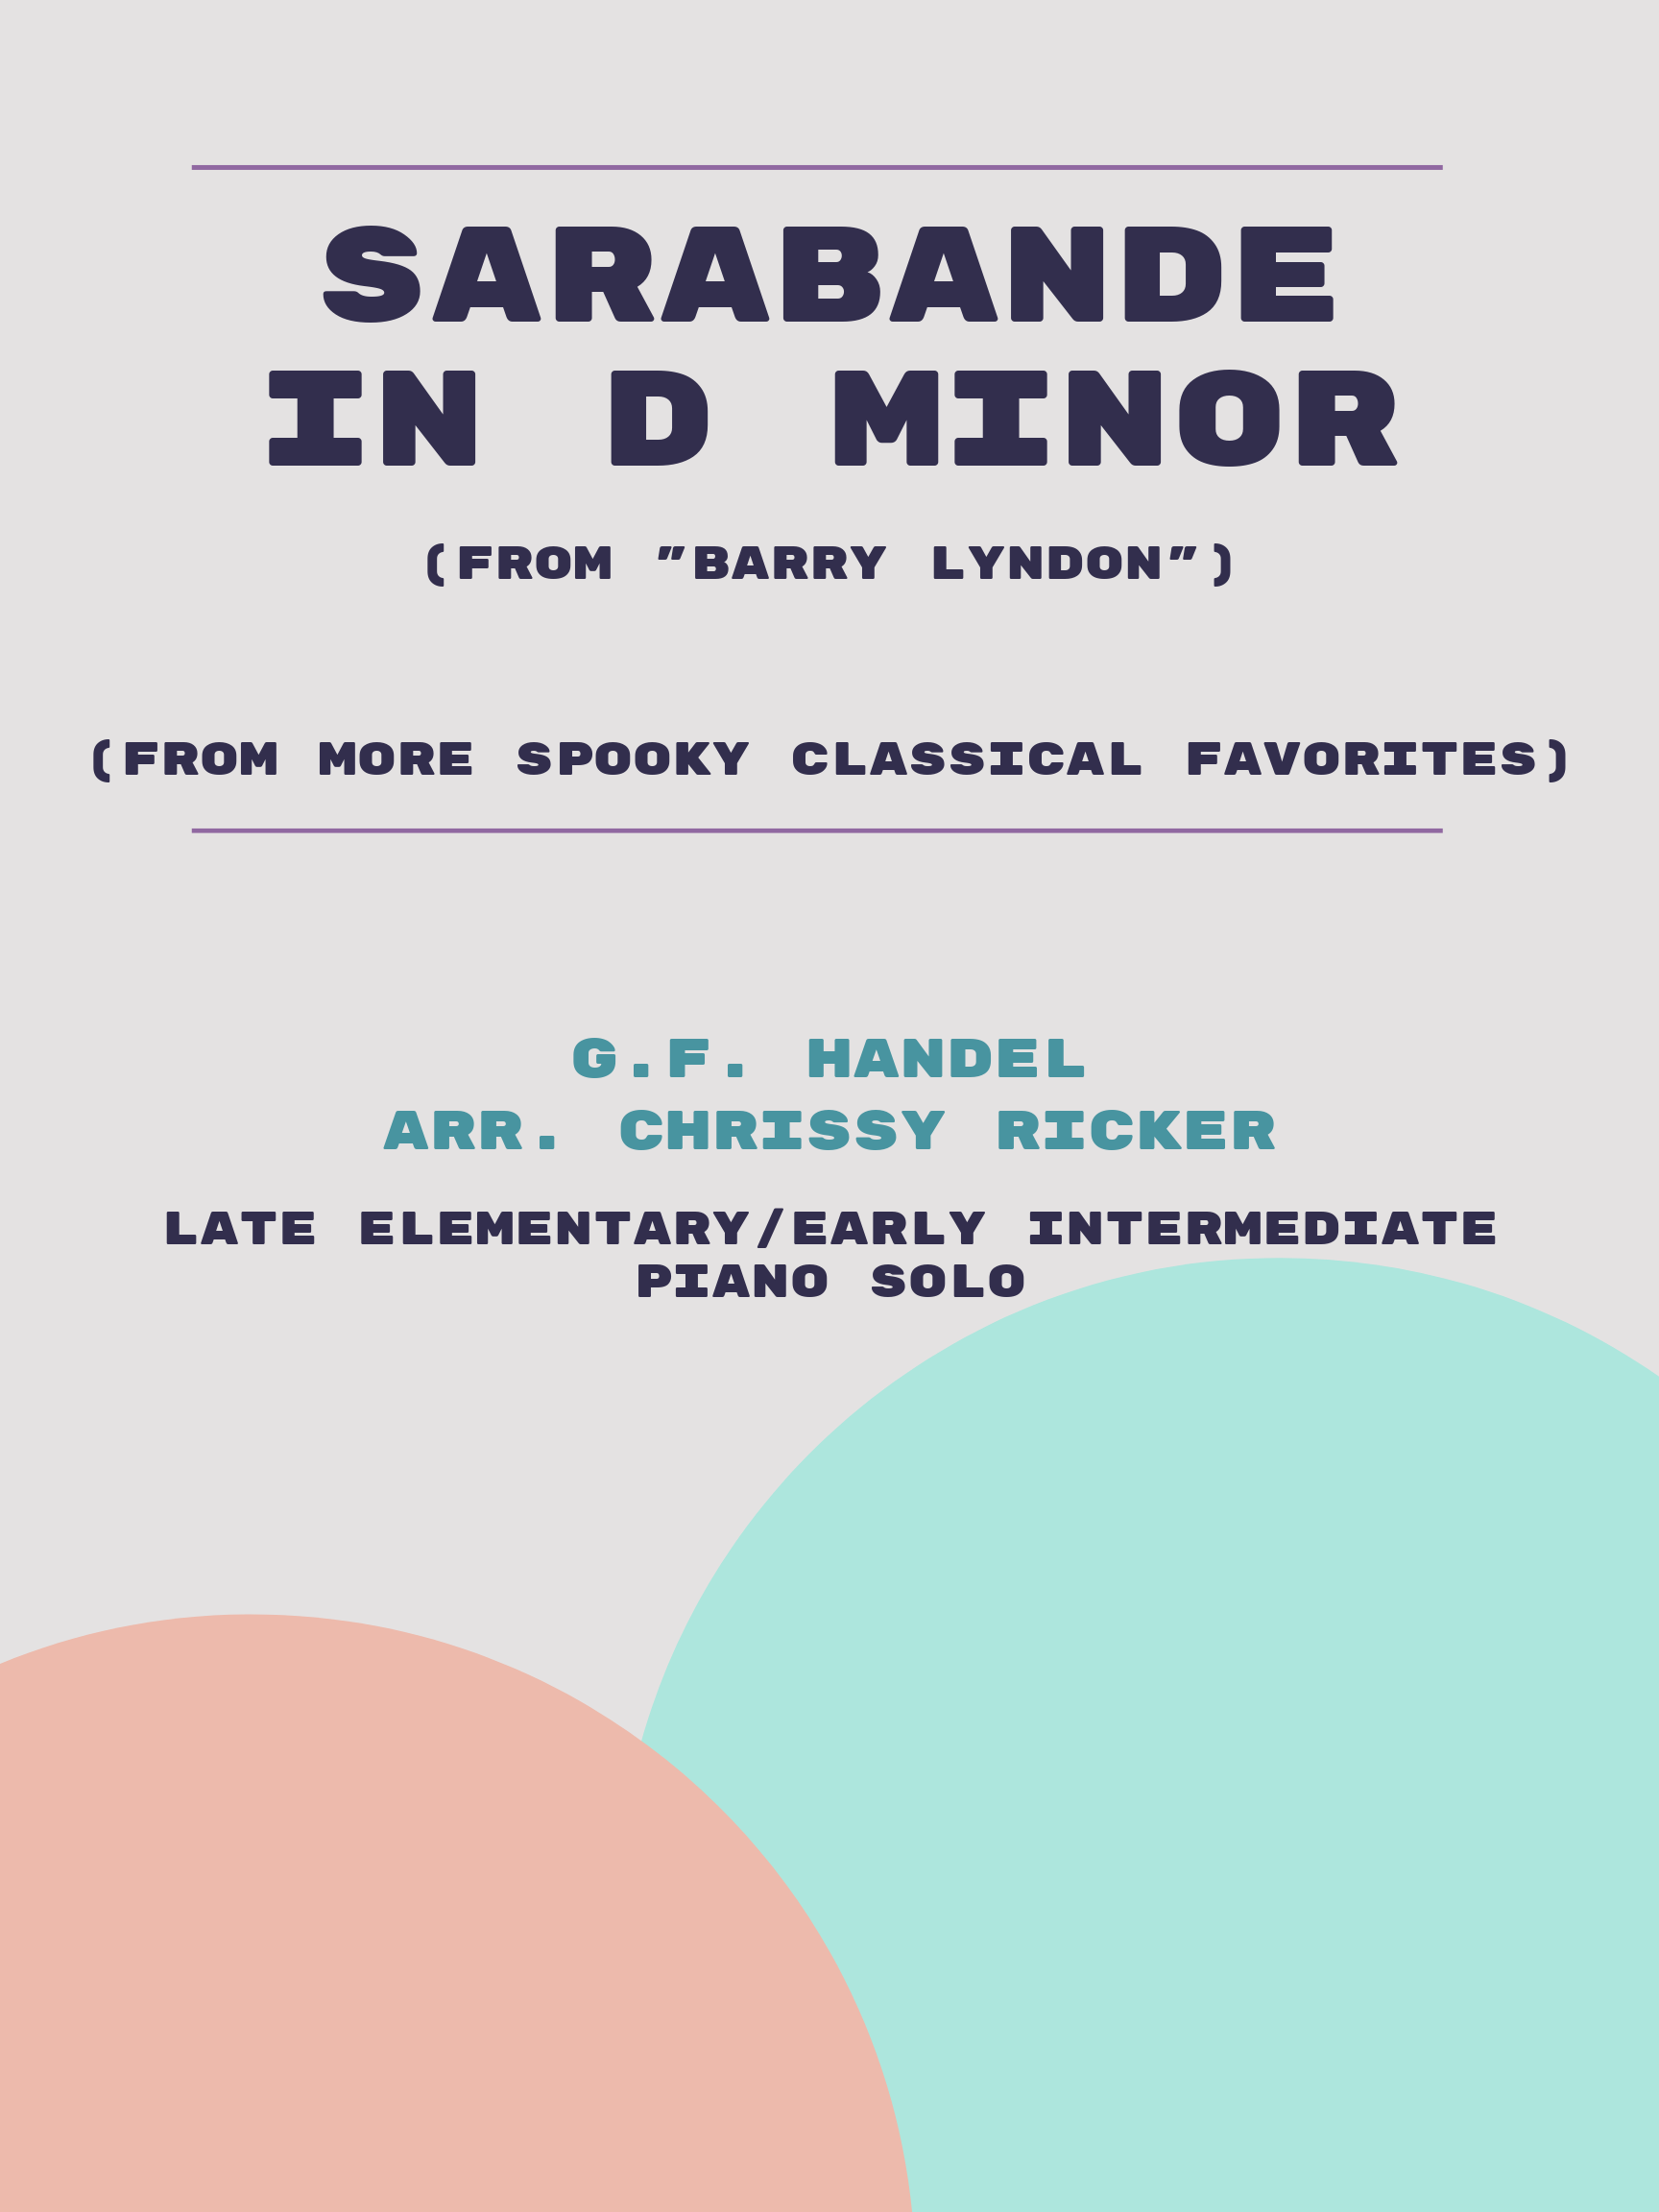 Sarabande in D Minor by G.F. Handel